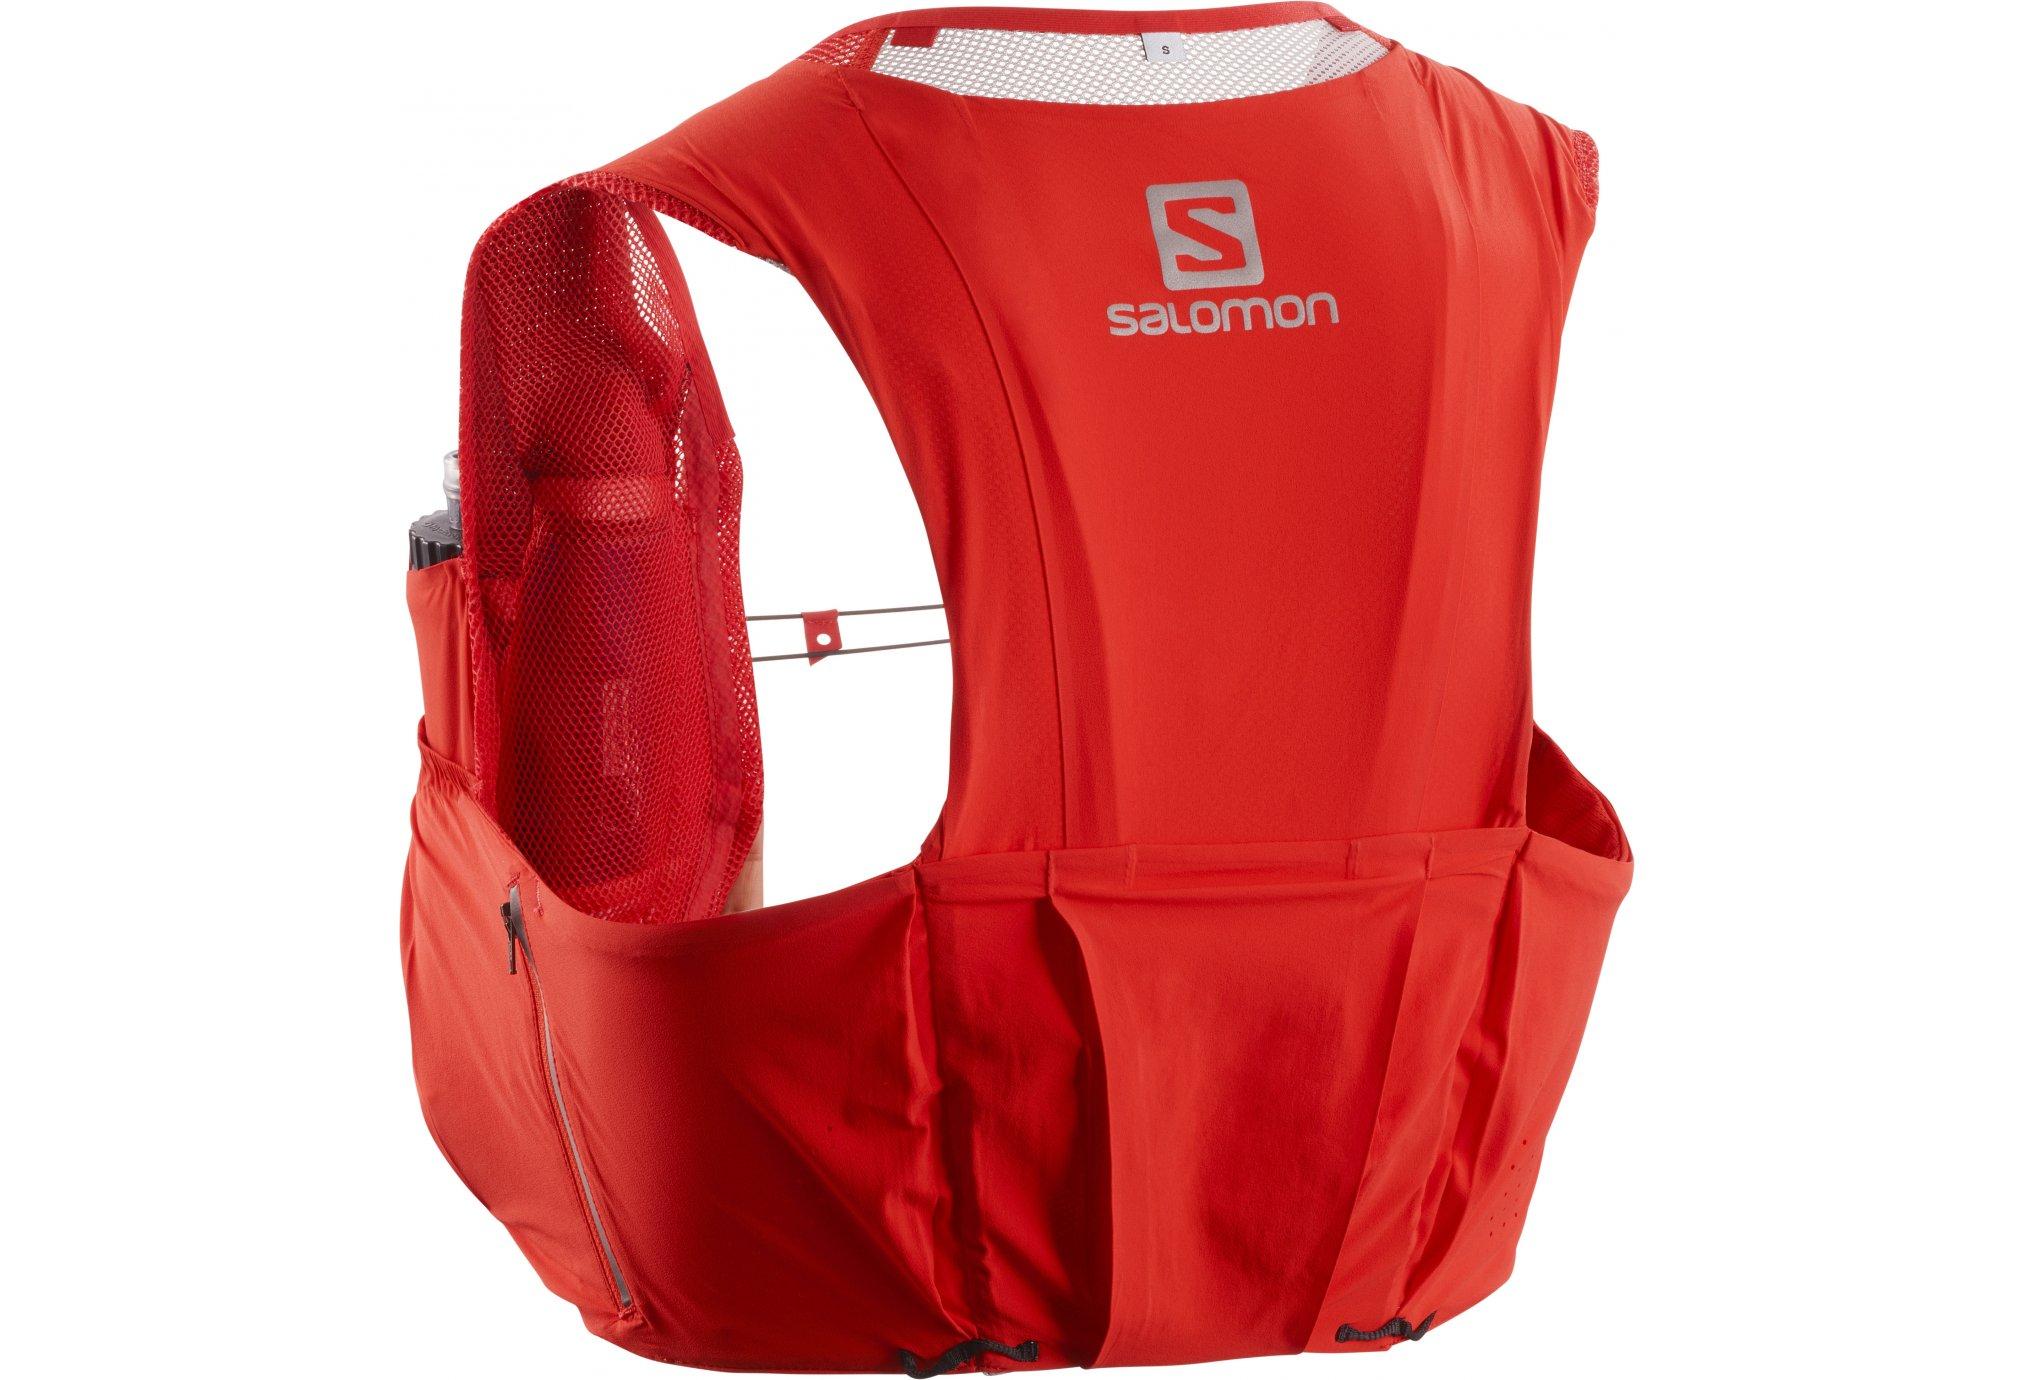 Salomon S-Lab Sense Ultra 8 SET Sac hydratation / Gourde